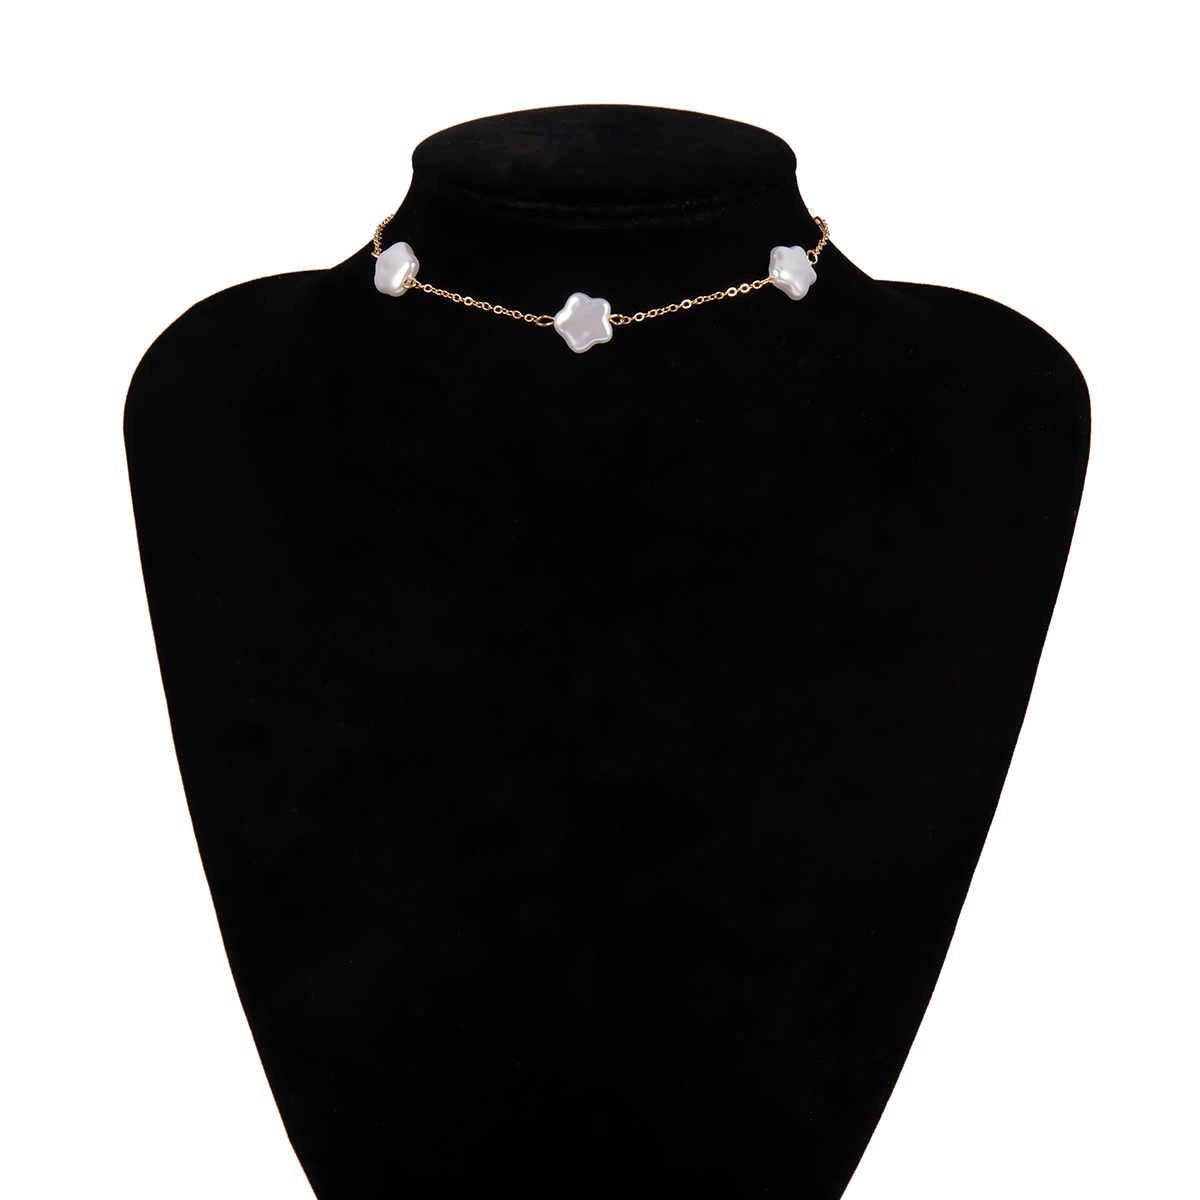 Gothic Baroque Pearl Star Choker สร้อยคองานแต่งงานแฟชั่นเครื่องประดับเกาหลีที่ไม่ซ้ำกันลูกปัดสร้อยคอสร้อยคอผู้หญิงที่ดีที่สุดของขวัญ